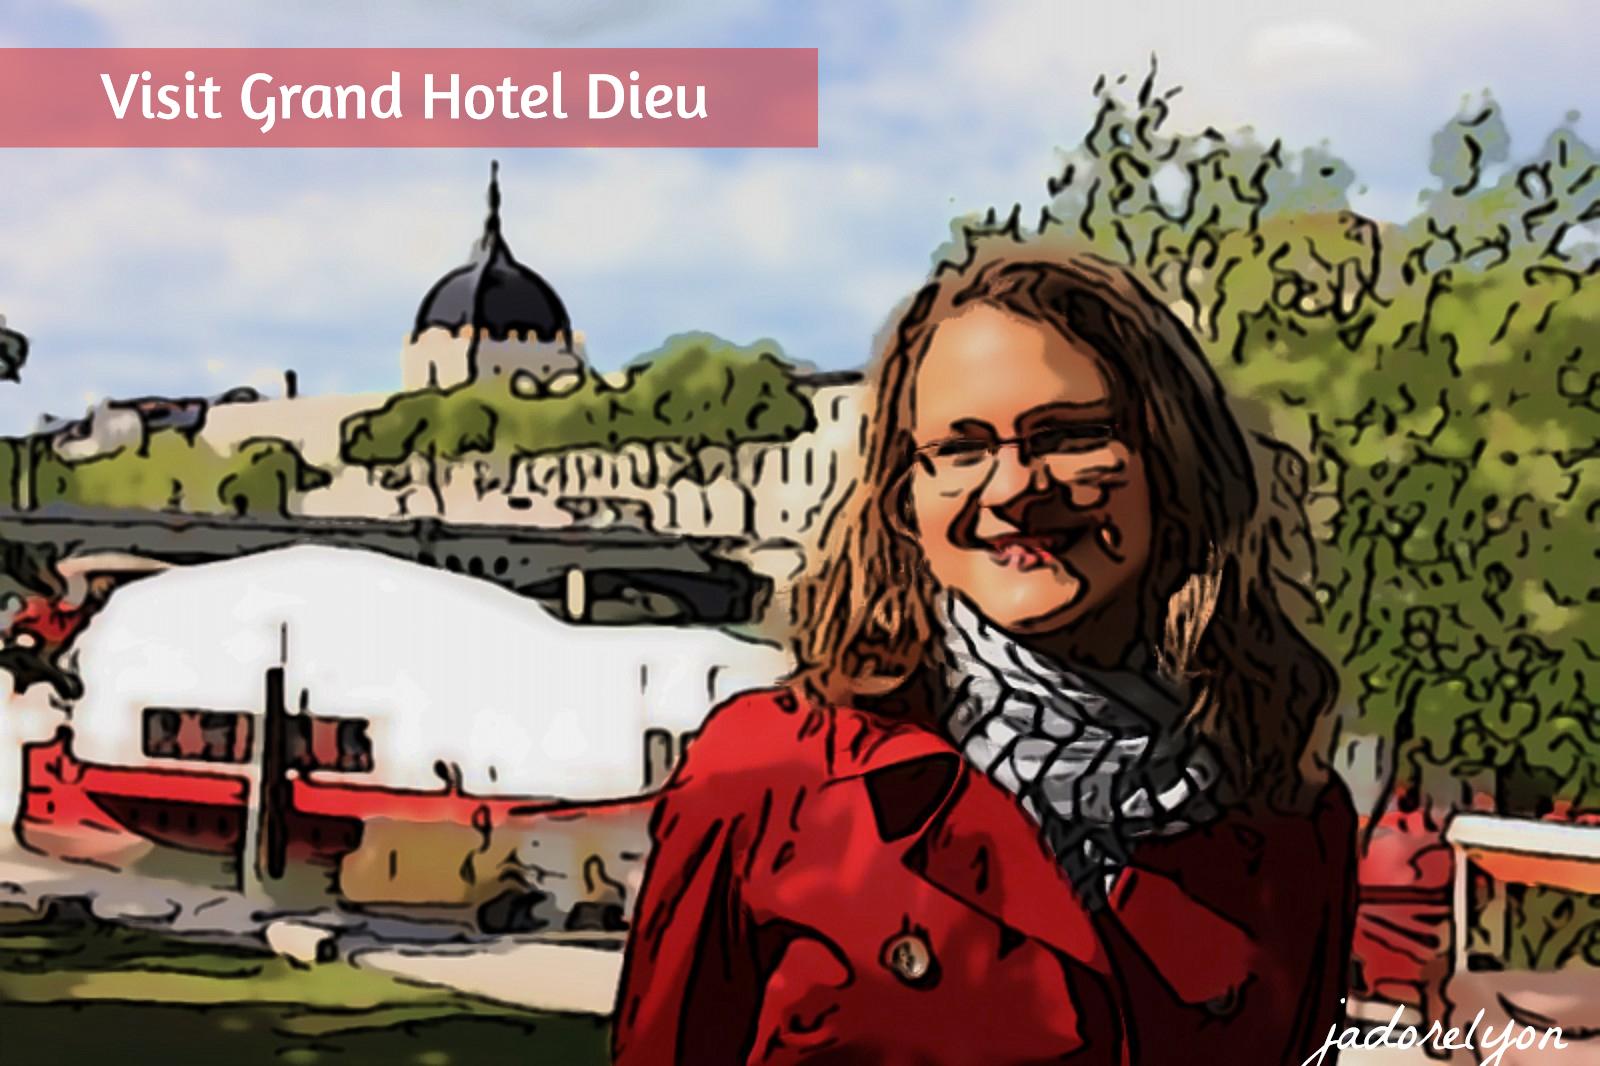 thegrandhoteldieu - visit